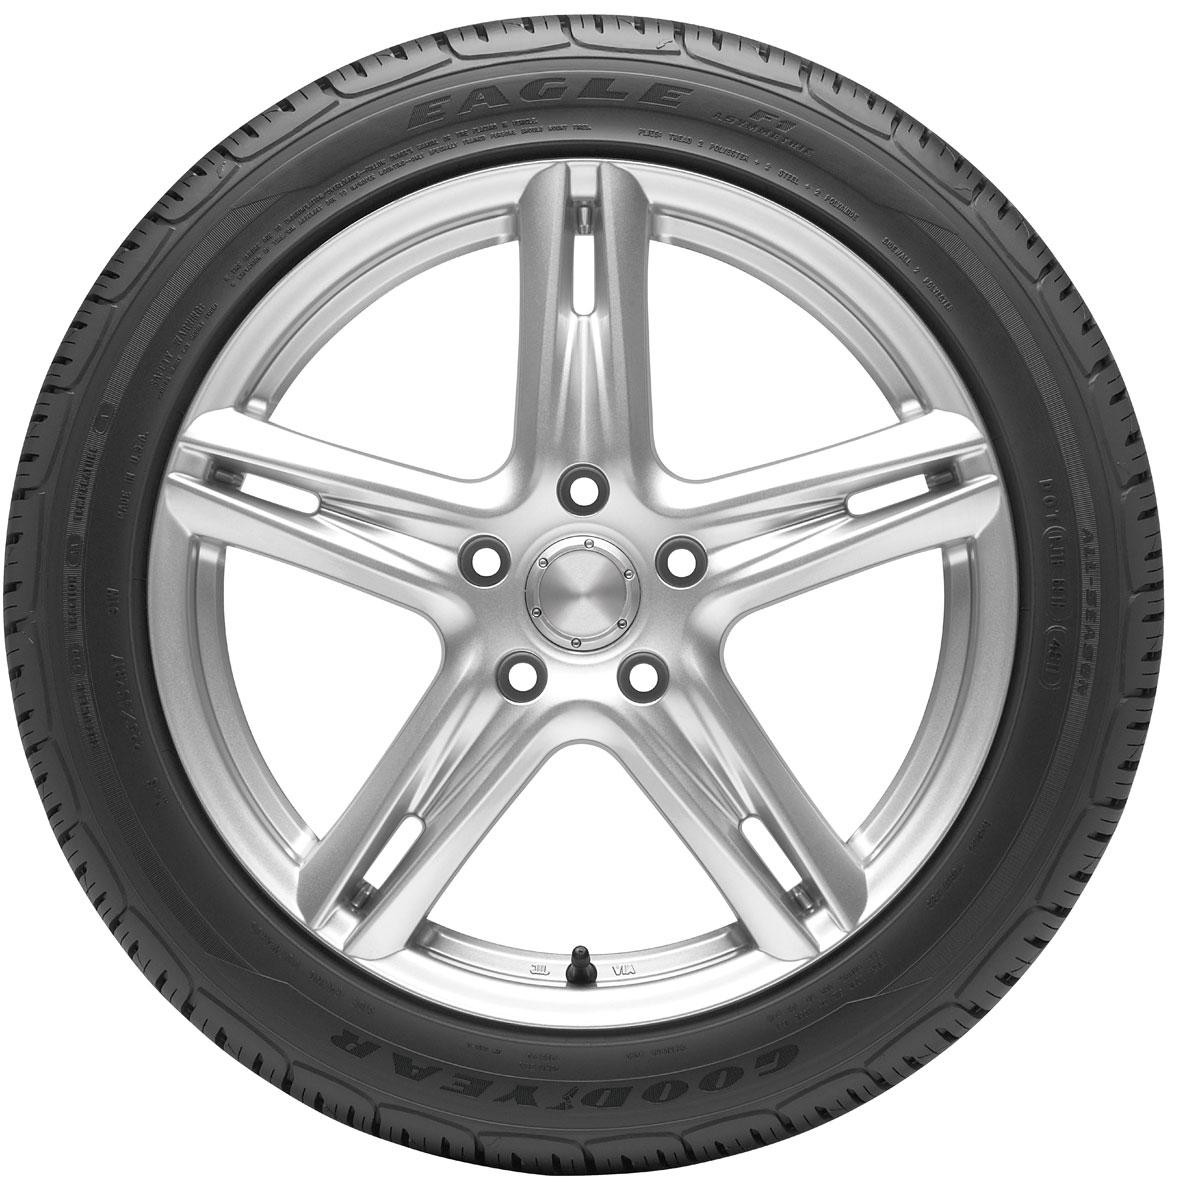 1200x1200 Car Tires Goodyear Tires Canada